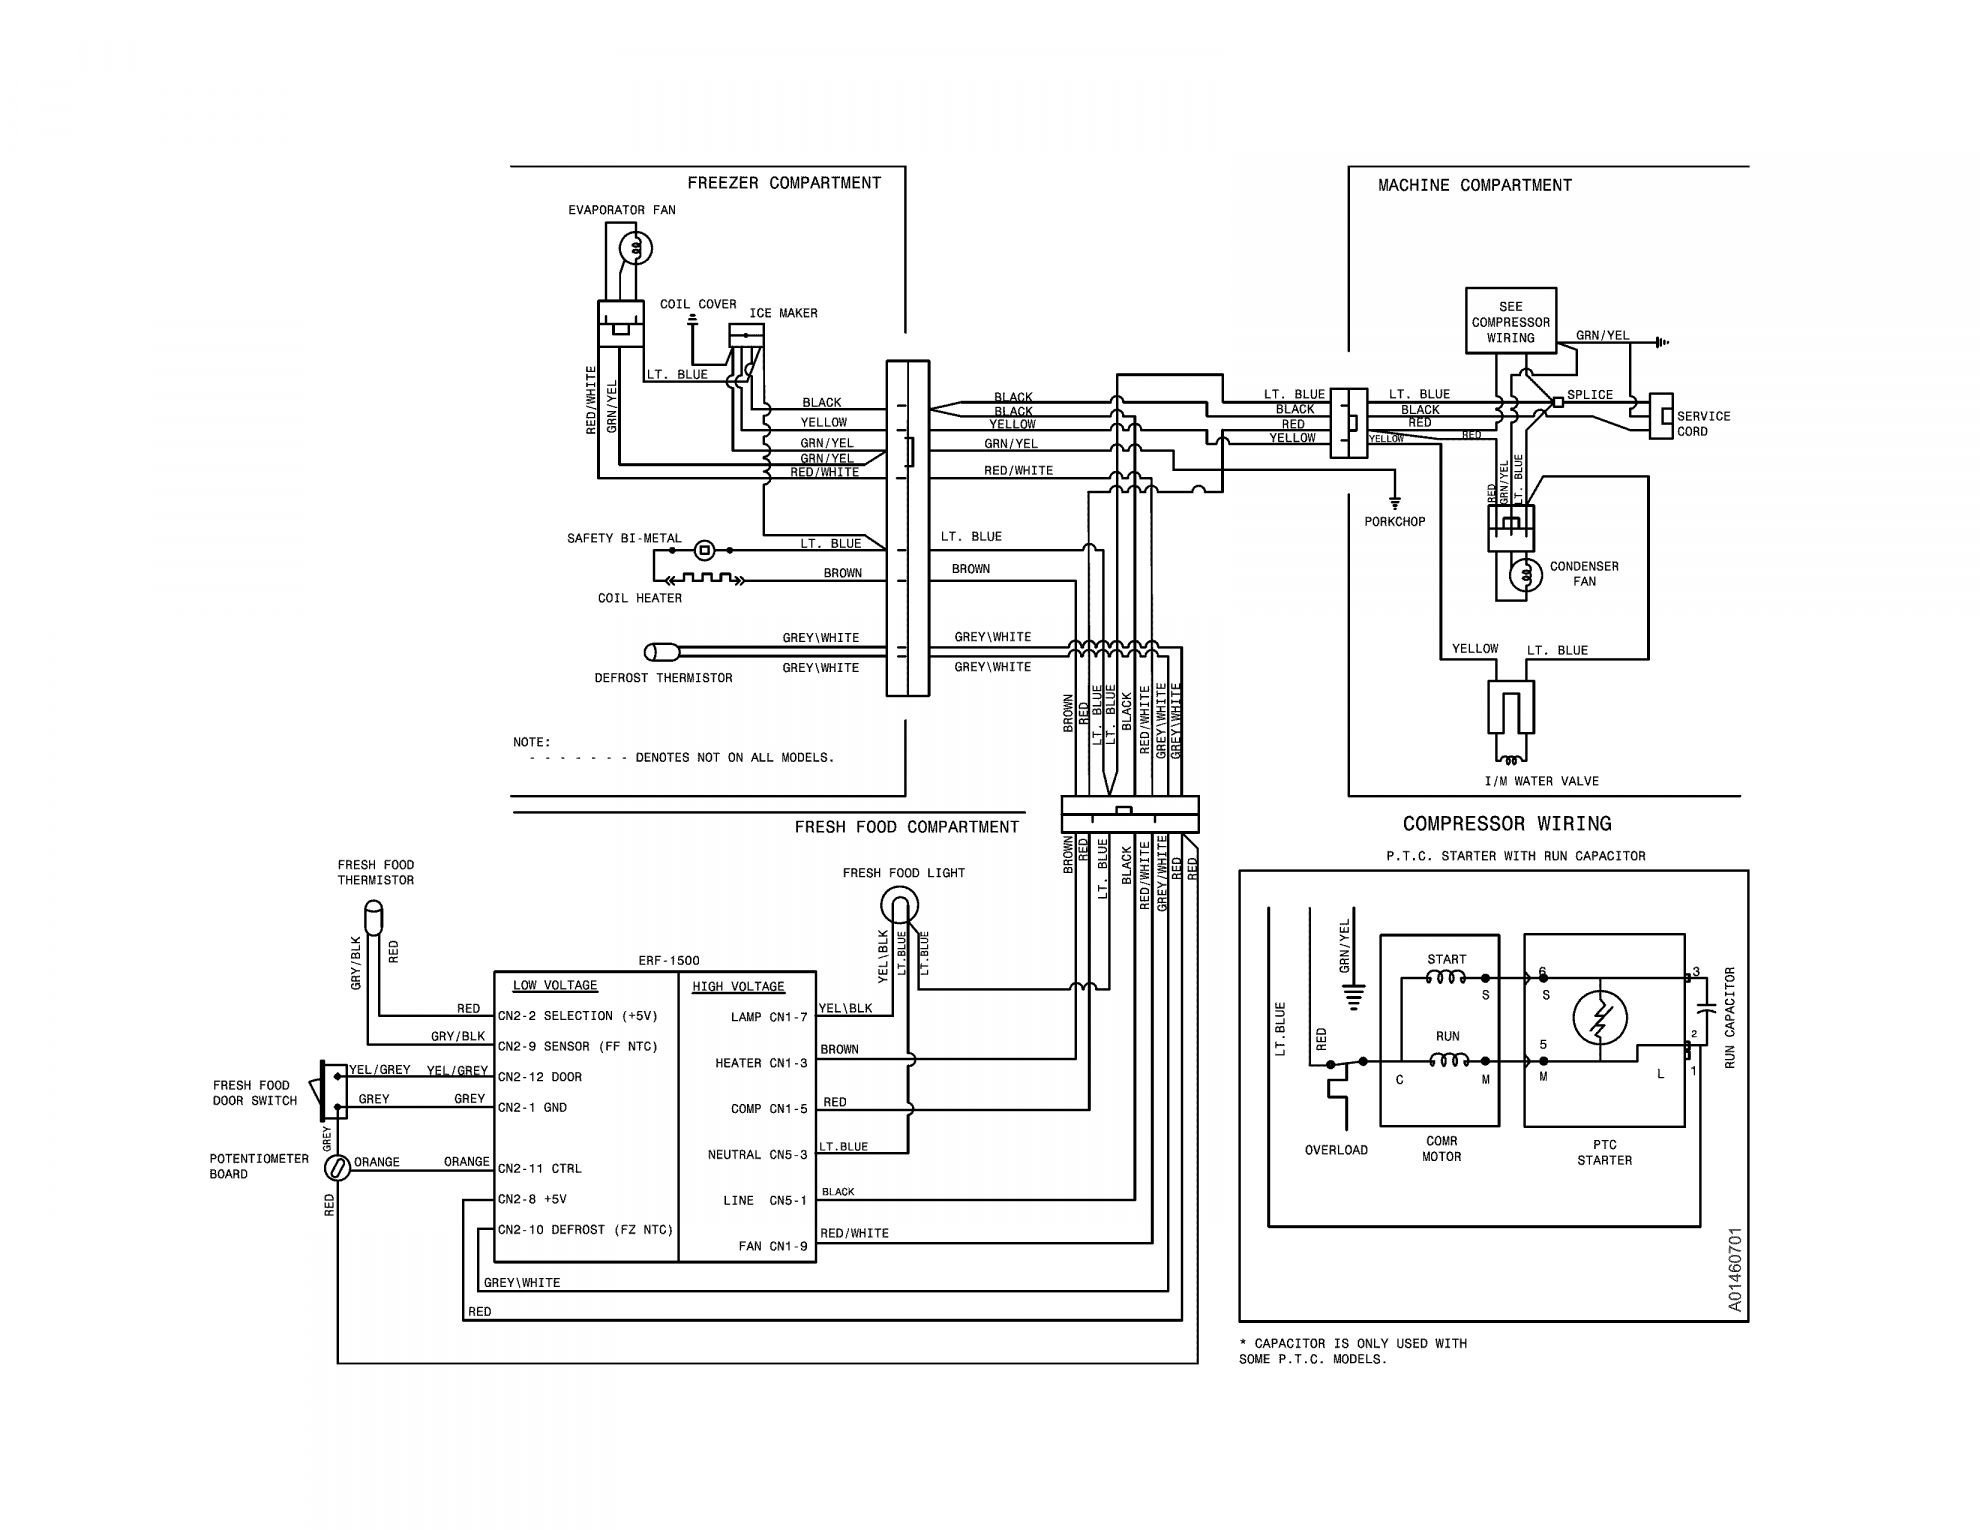 17 Frigidaire Electric Range Wiring Diagram Wiring Diagram Wiringg Net In 2020 Kenmore Refrigerator Frigidaire Gallery Refrigerator Frigidaire